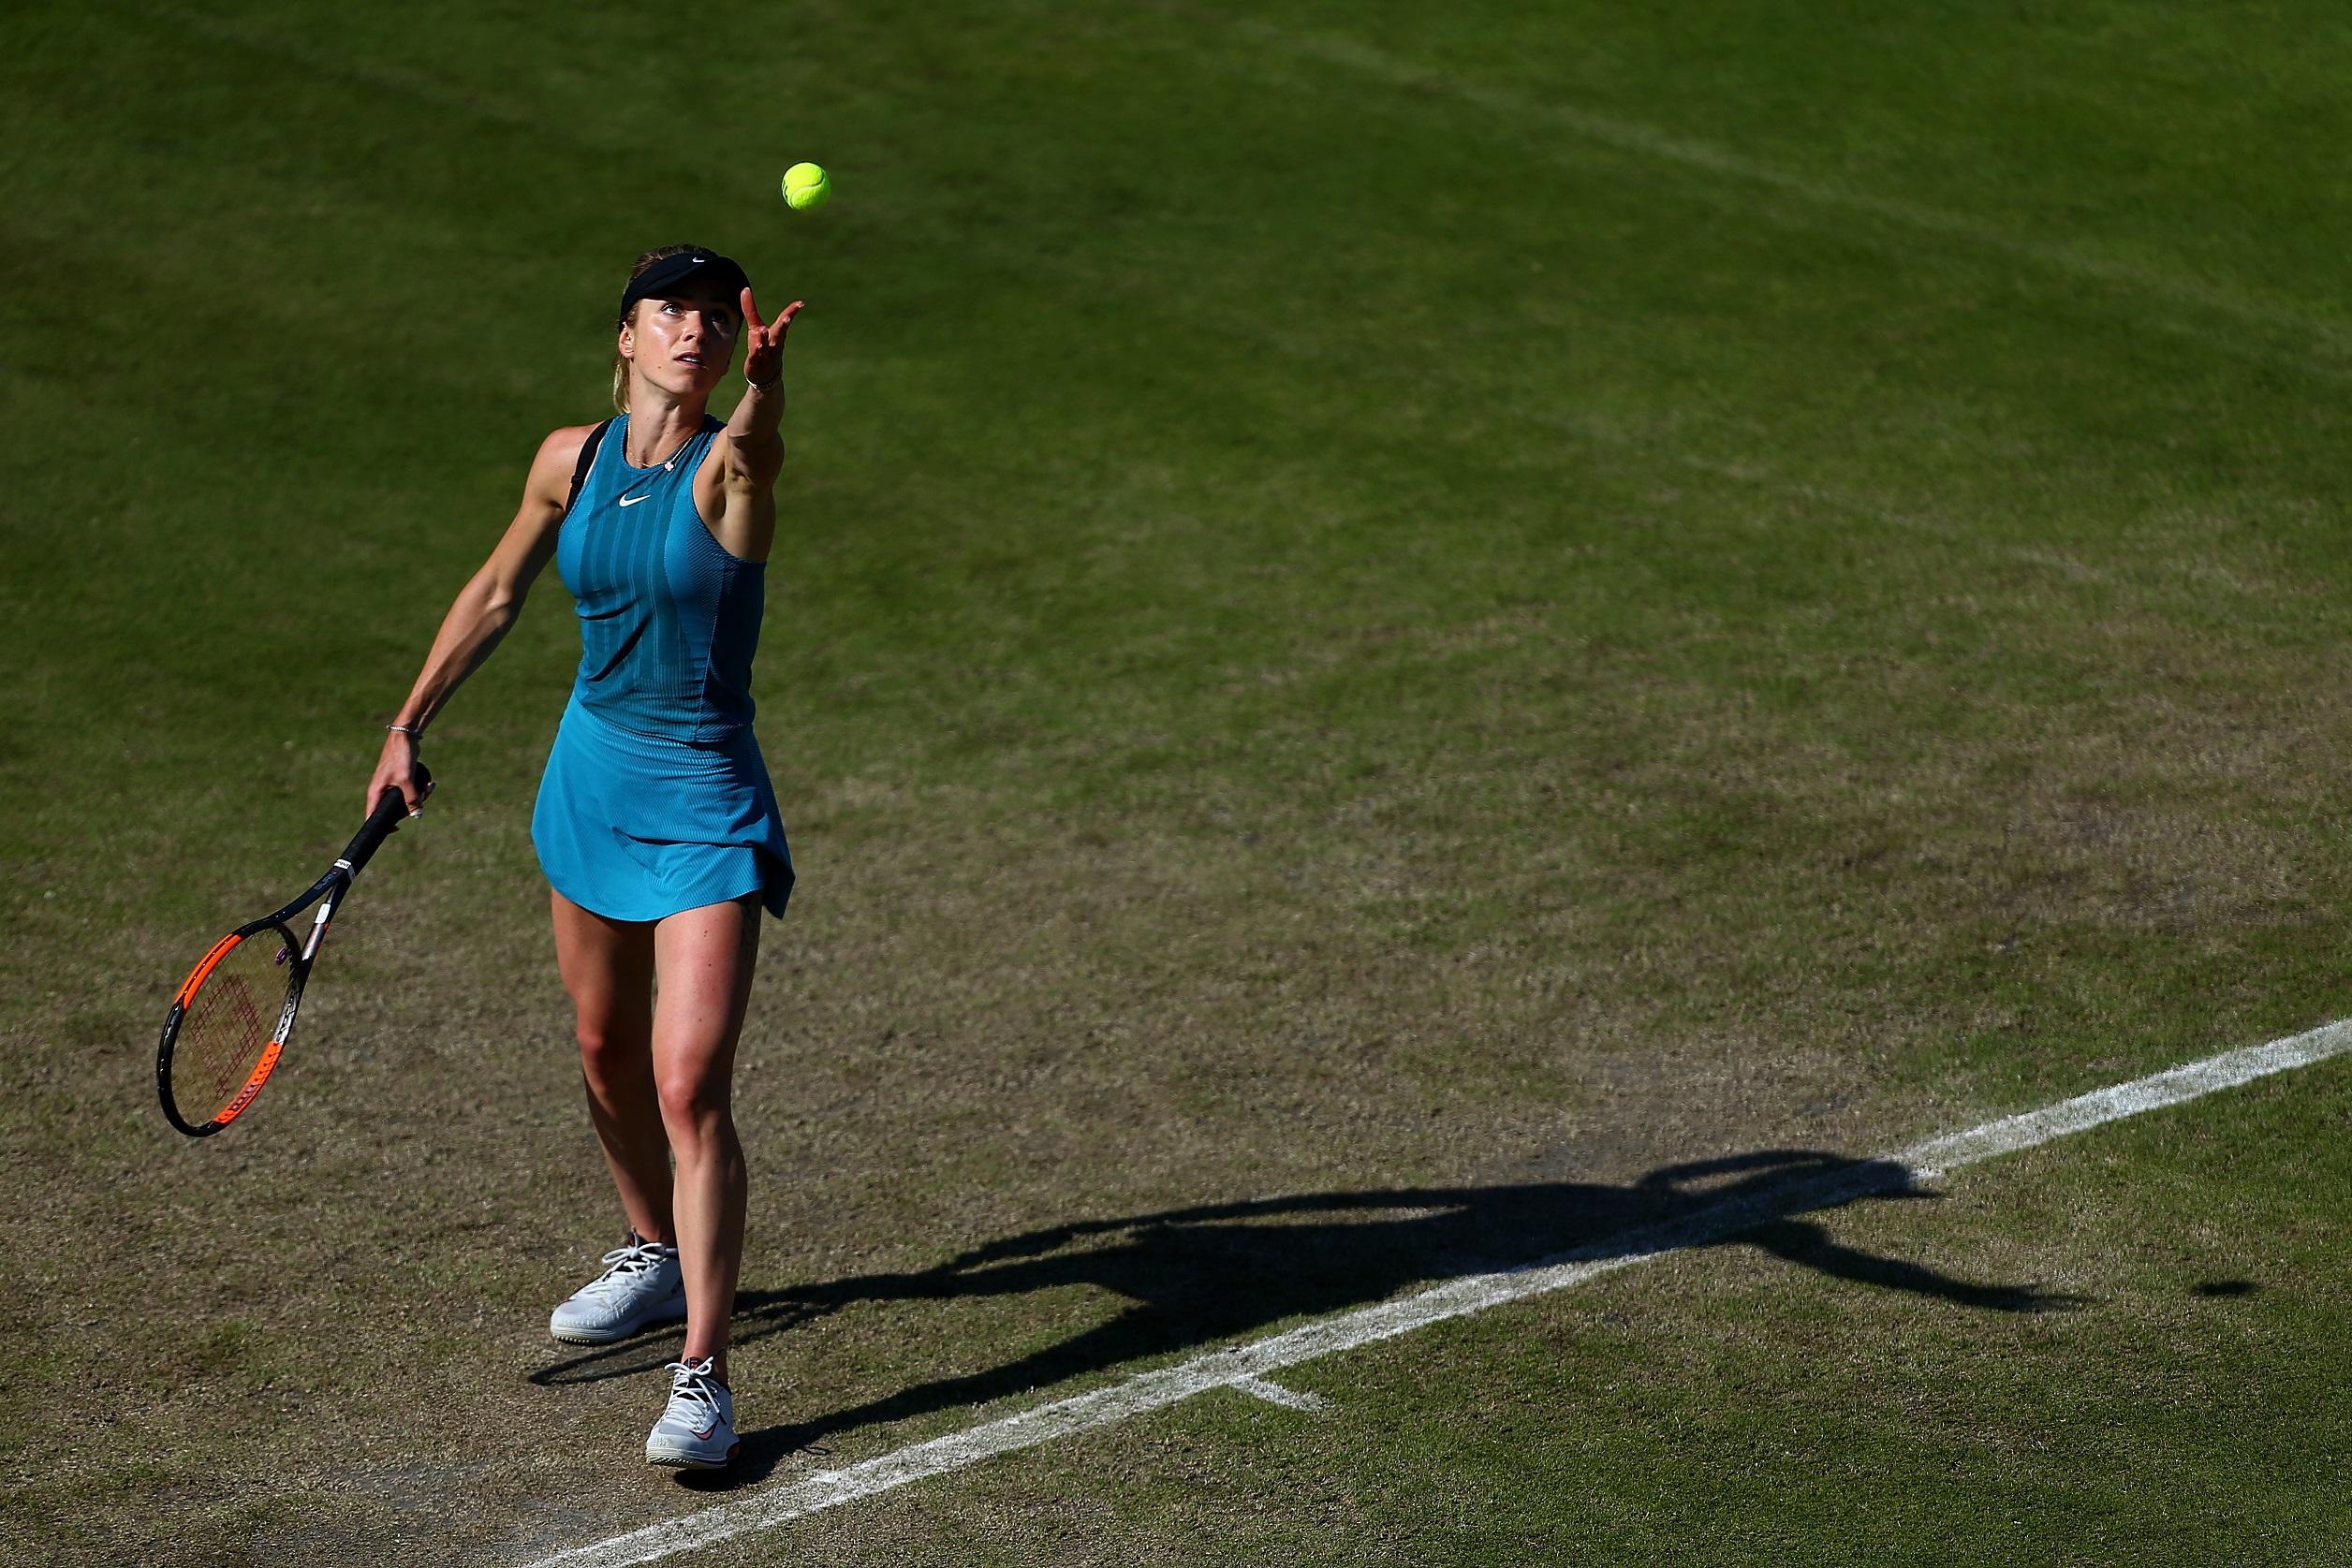 Elina Svitolina of Ukraine serves during her quarter-final match against Mihaela Buzarnescu